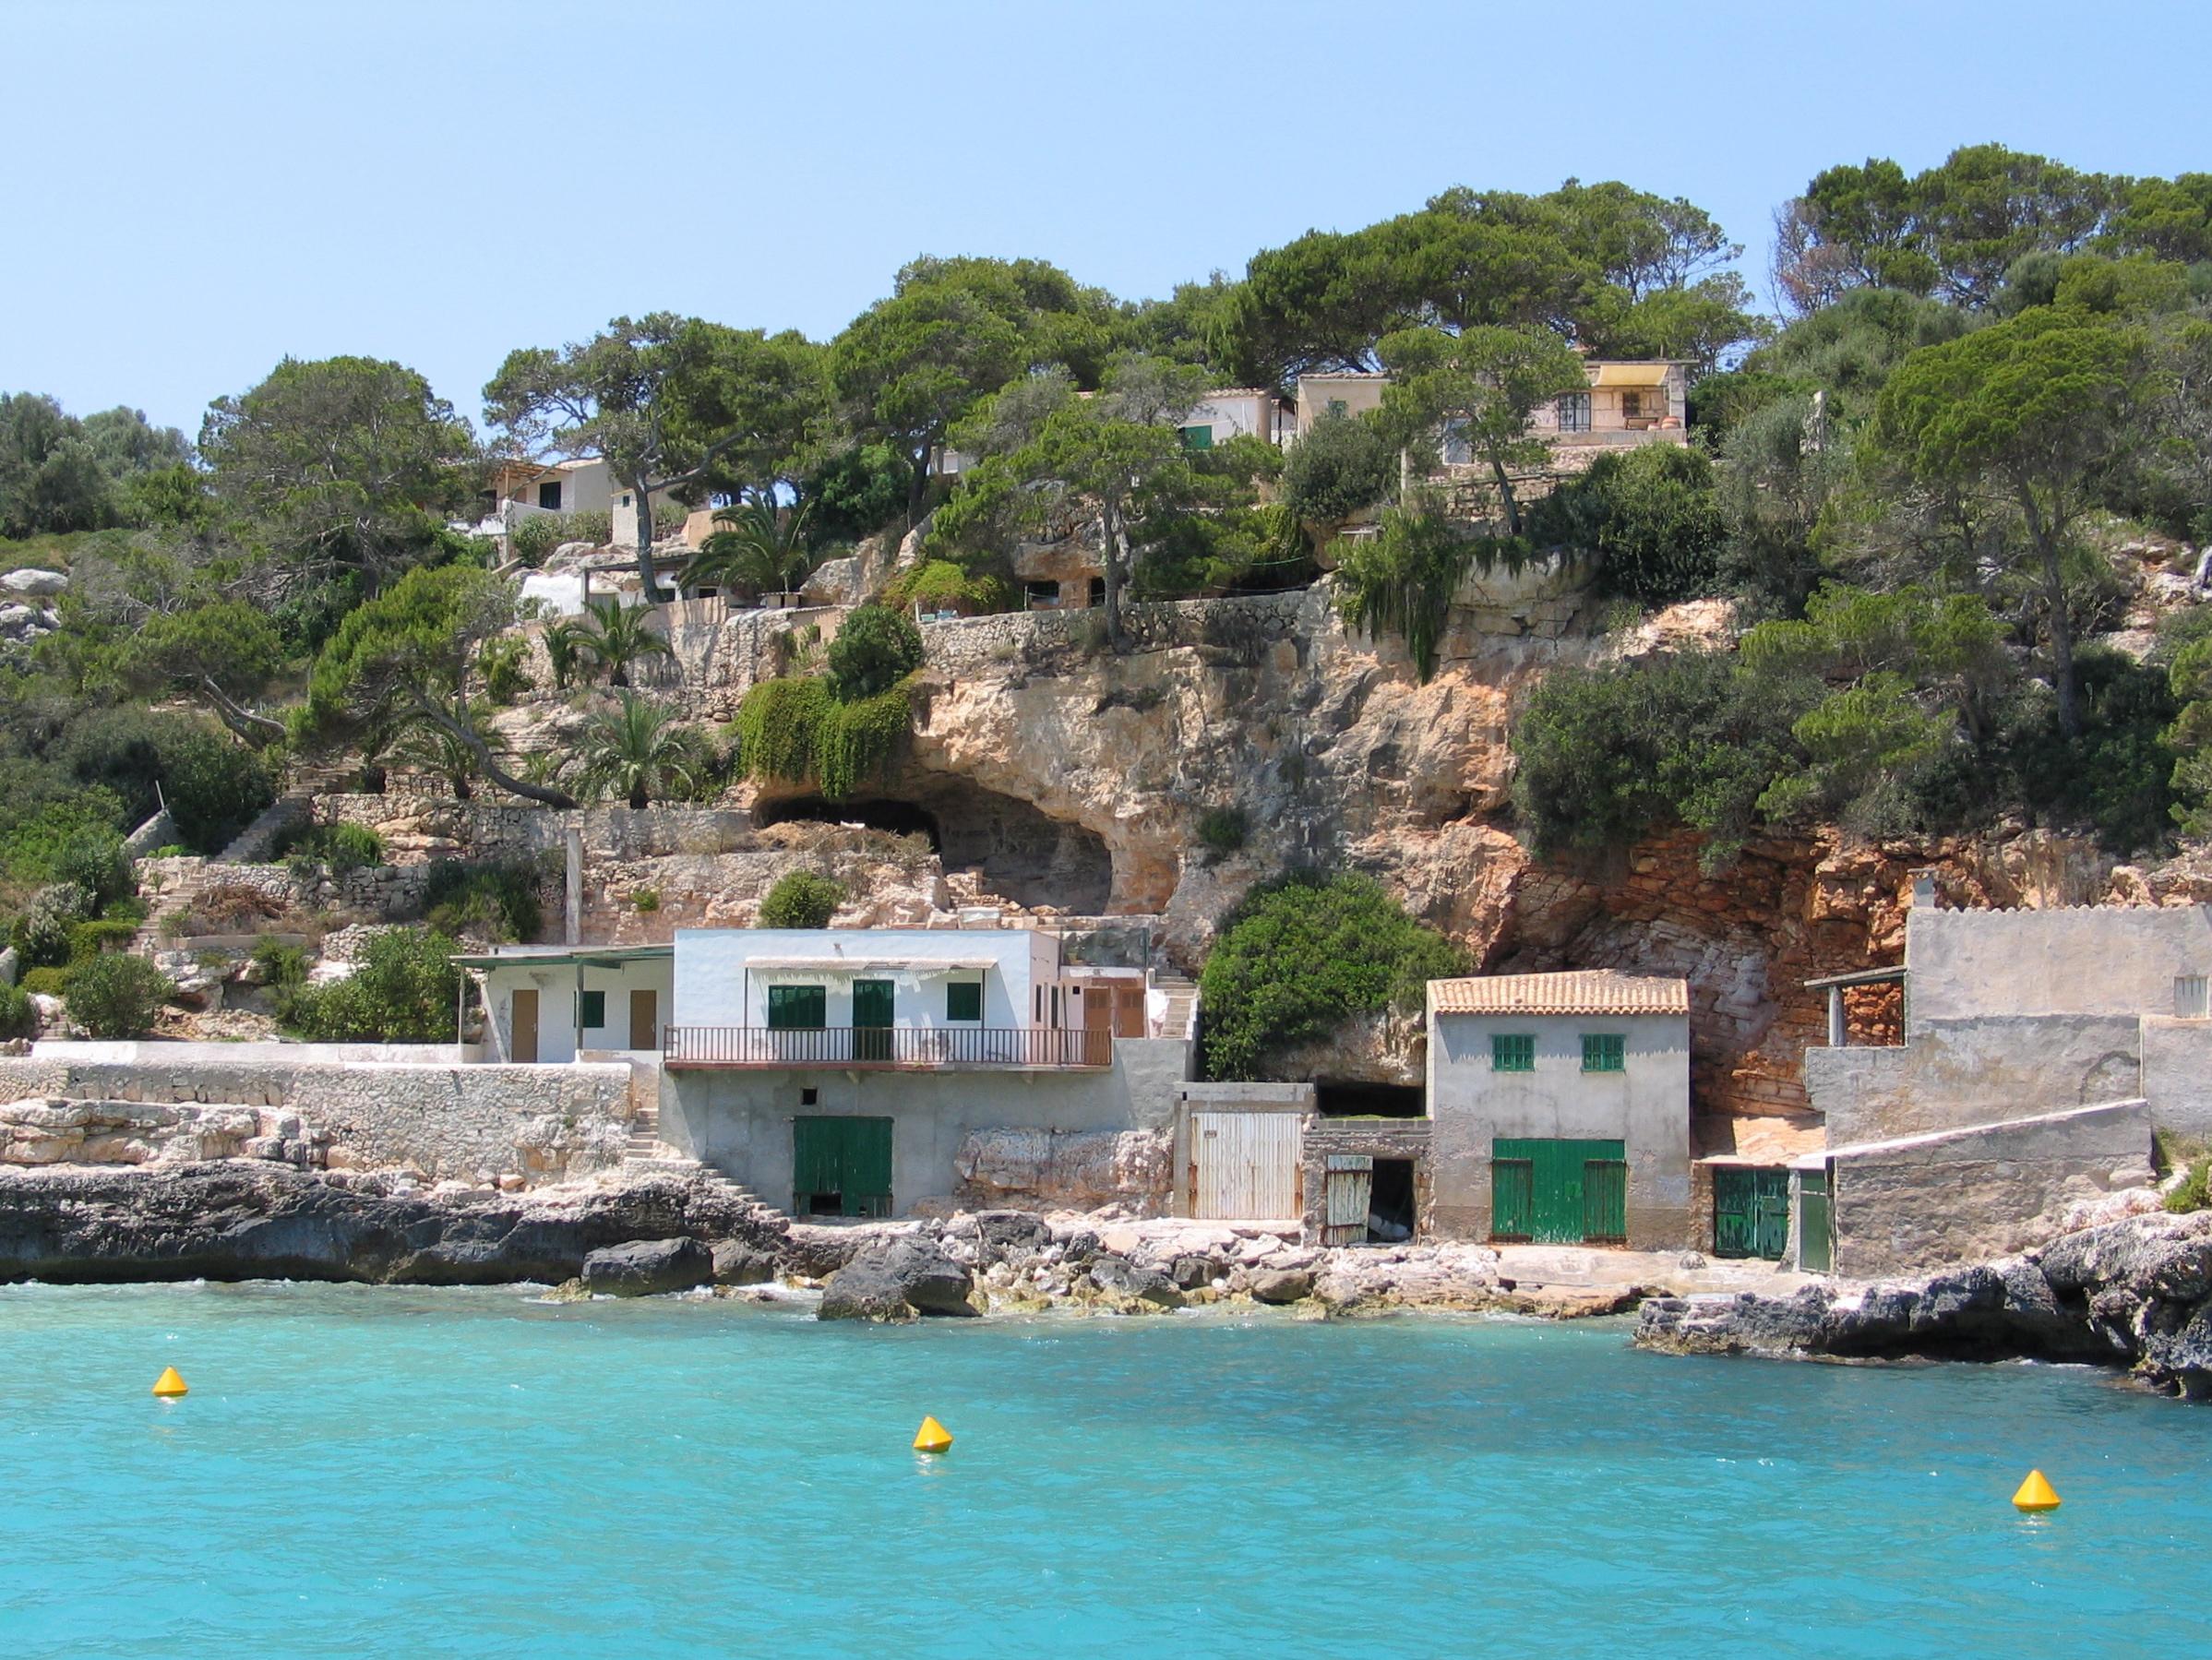 Datei:Mallorca-Cala Llombards.jpg – Wikipedia